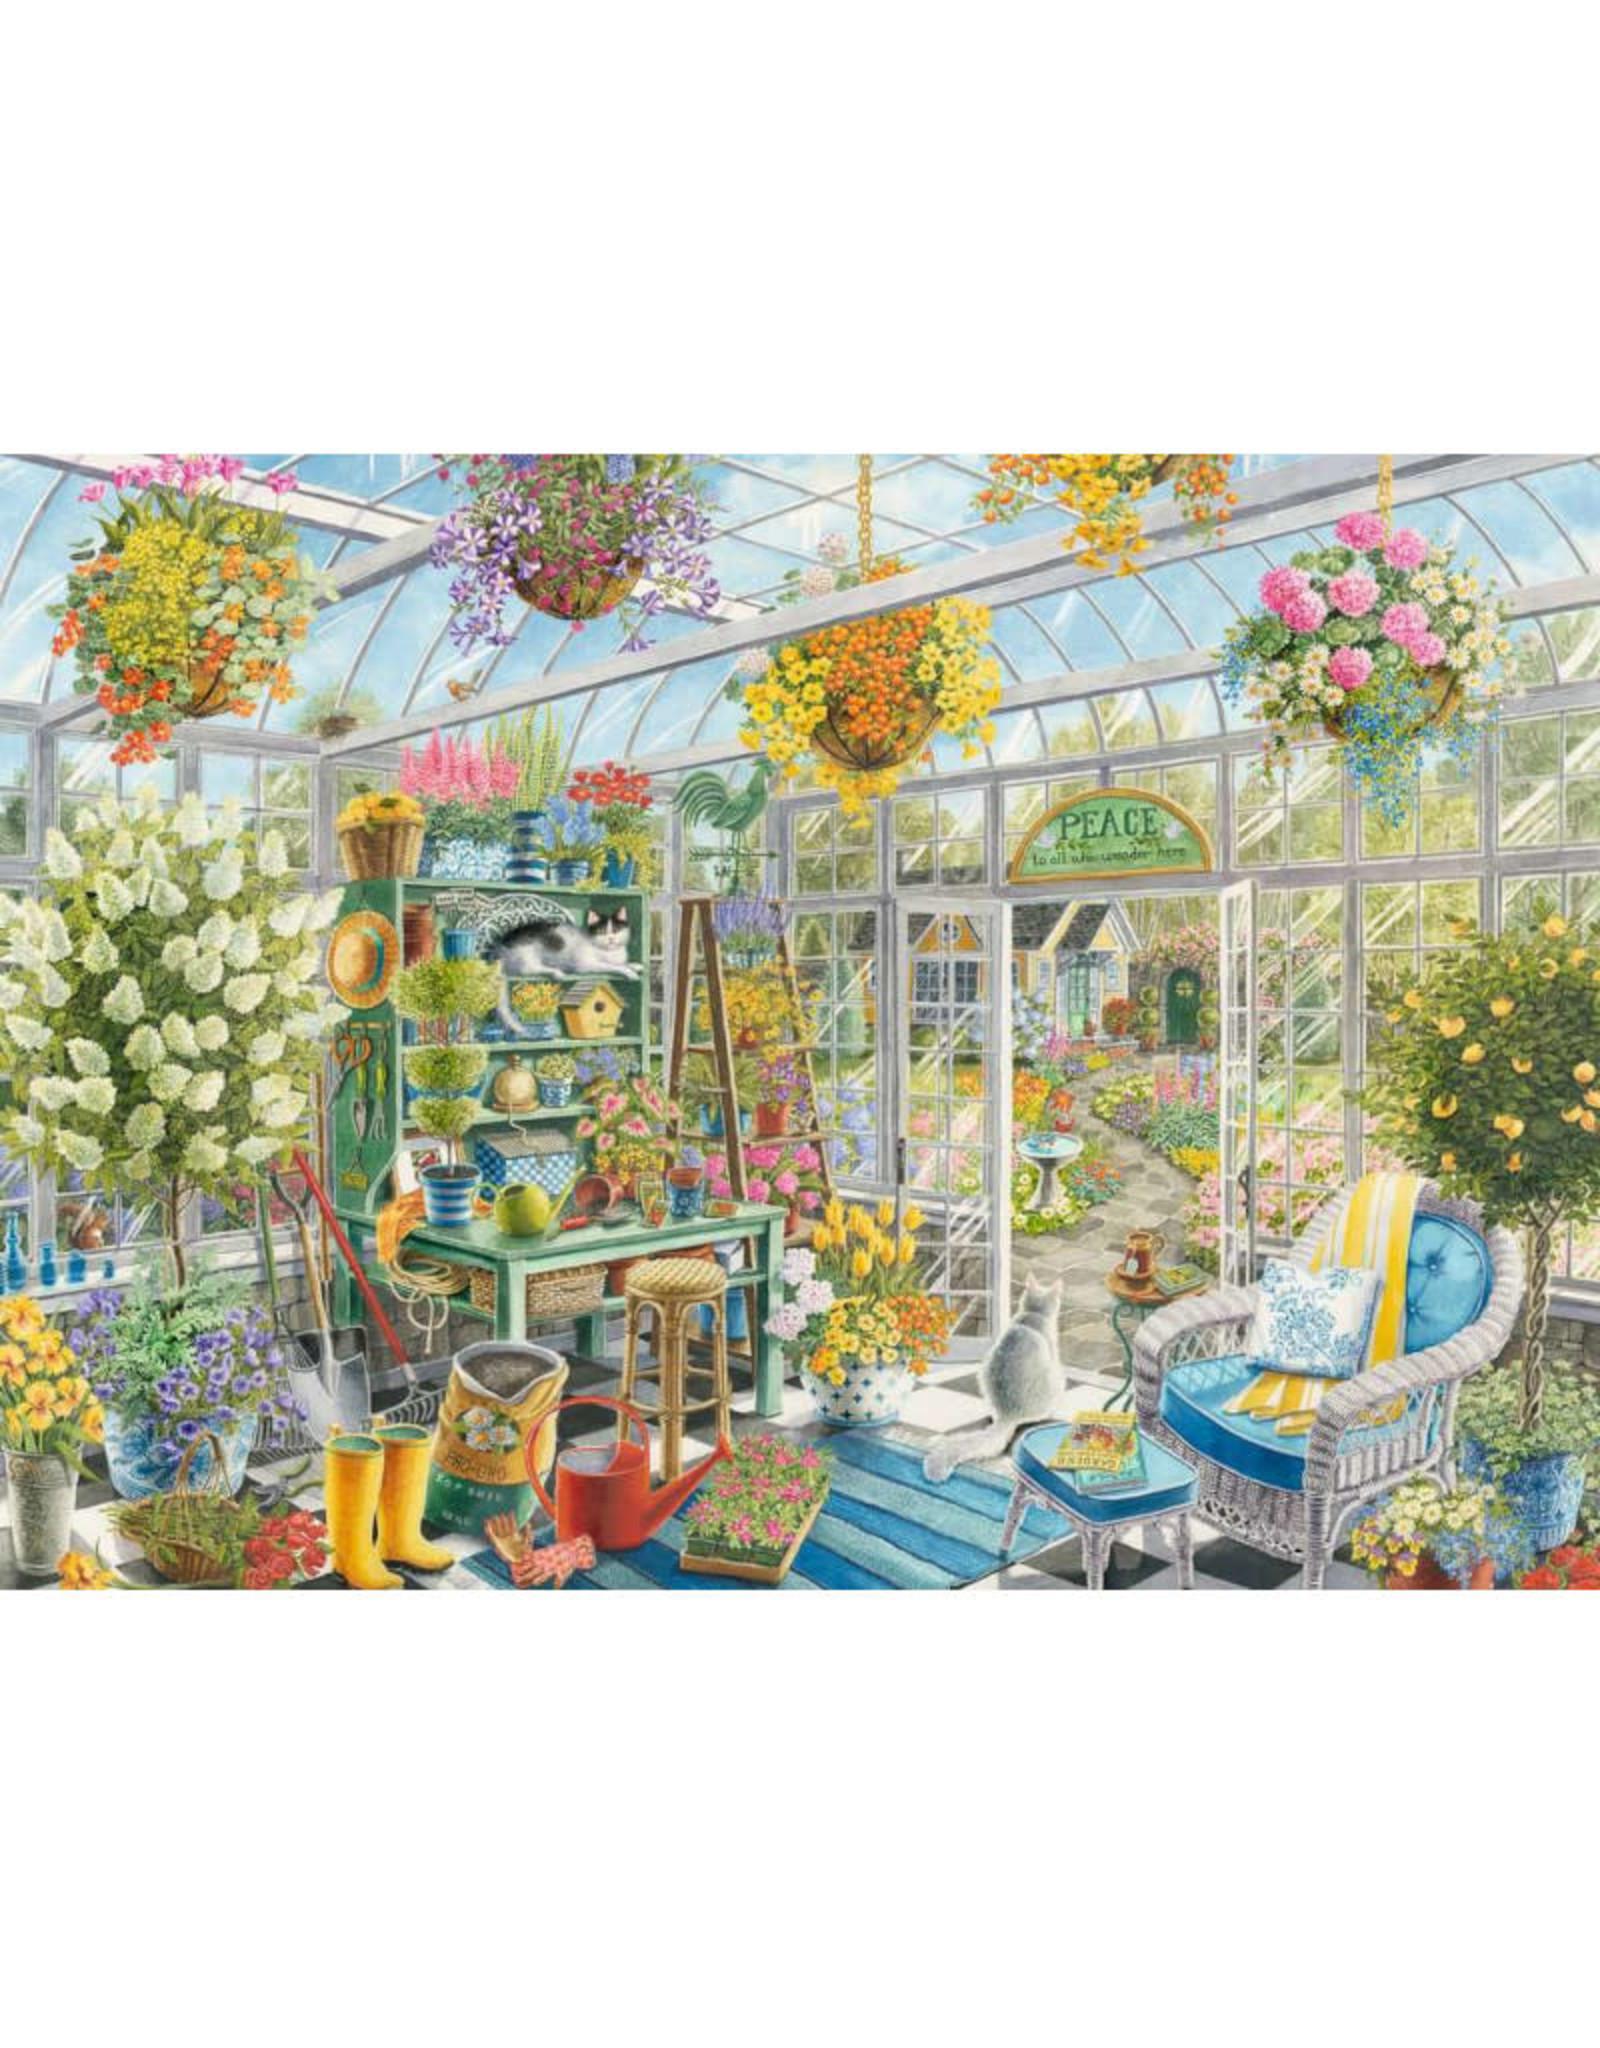 Ravensburger Greenhouse Heaven Puzzle 300 PCS Large Fromat